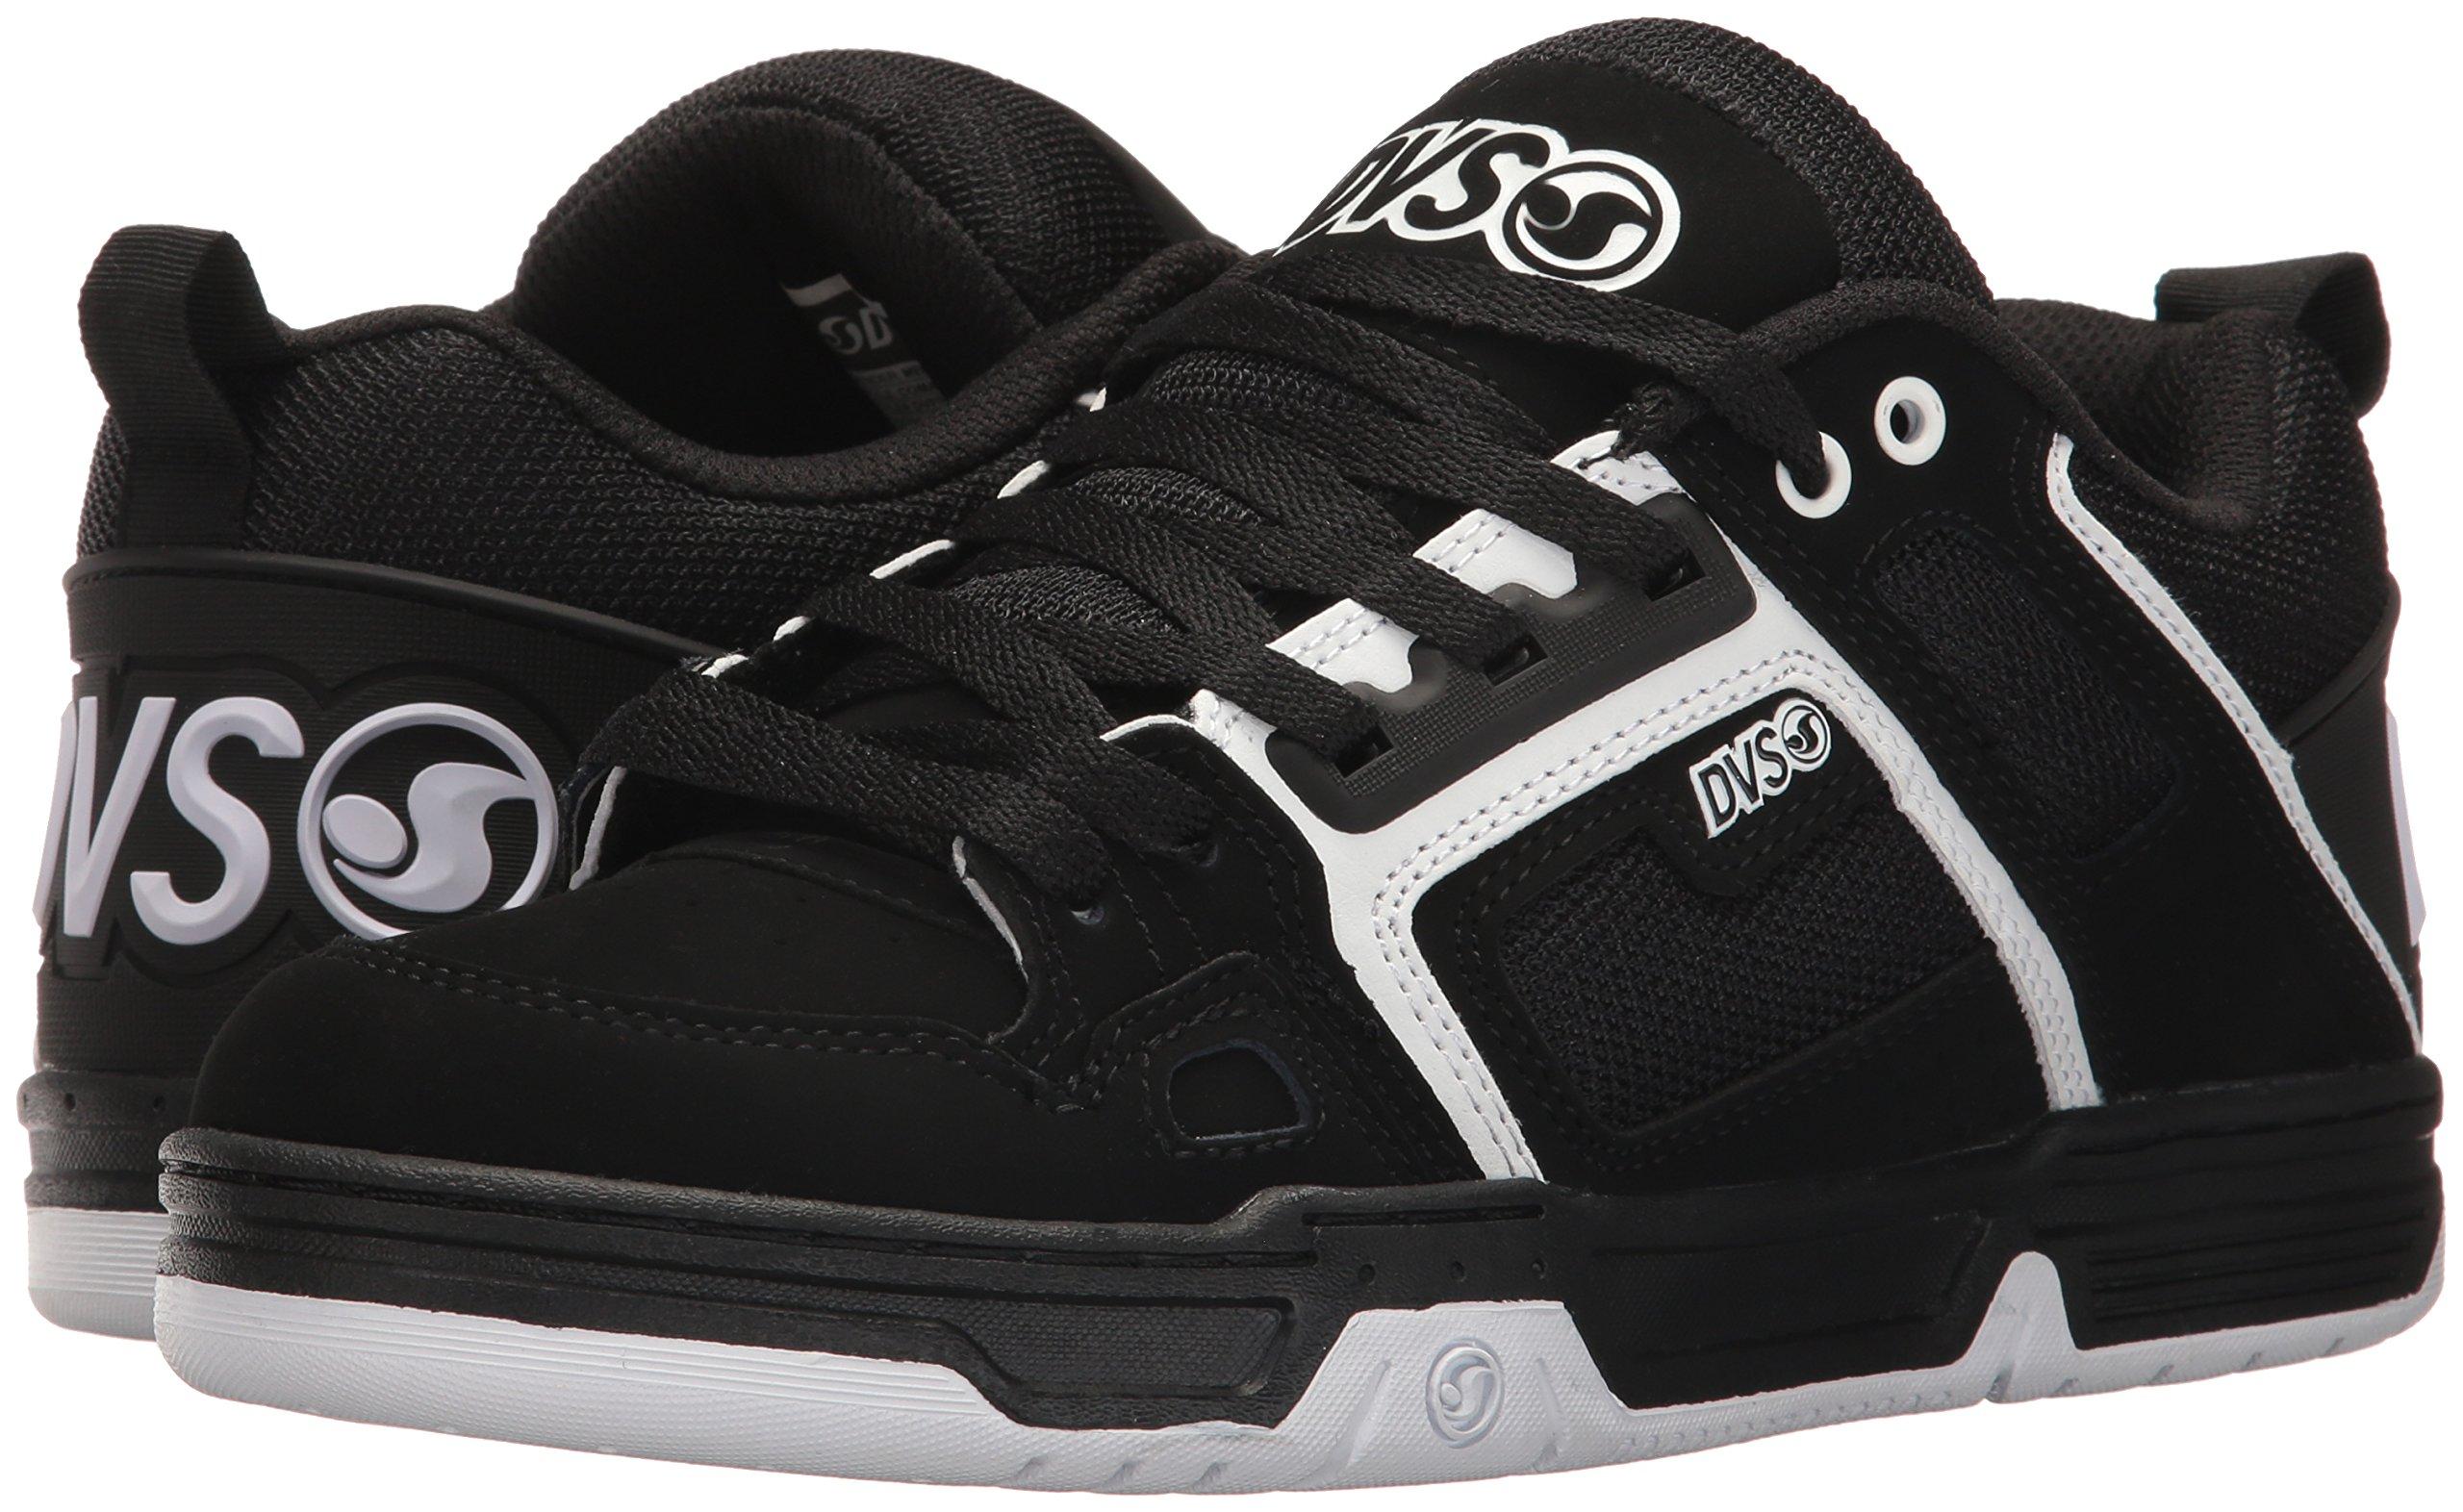 DVS Men's Comanche Skate Shoe, Black/White Nubuck, 12 Medium US by DVS (Image #6)